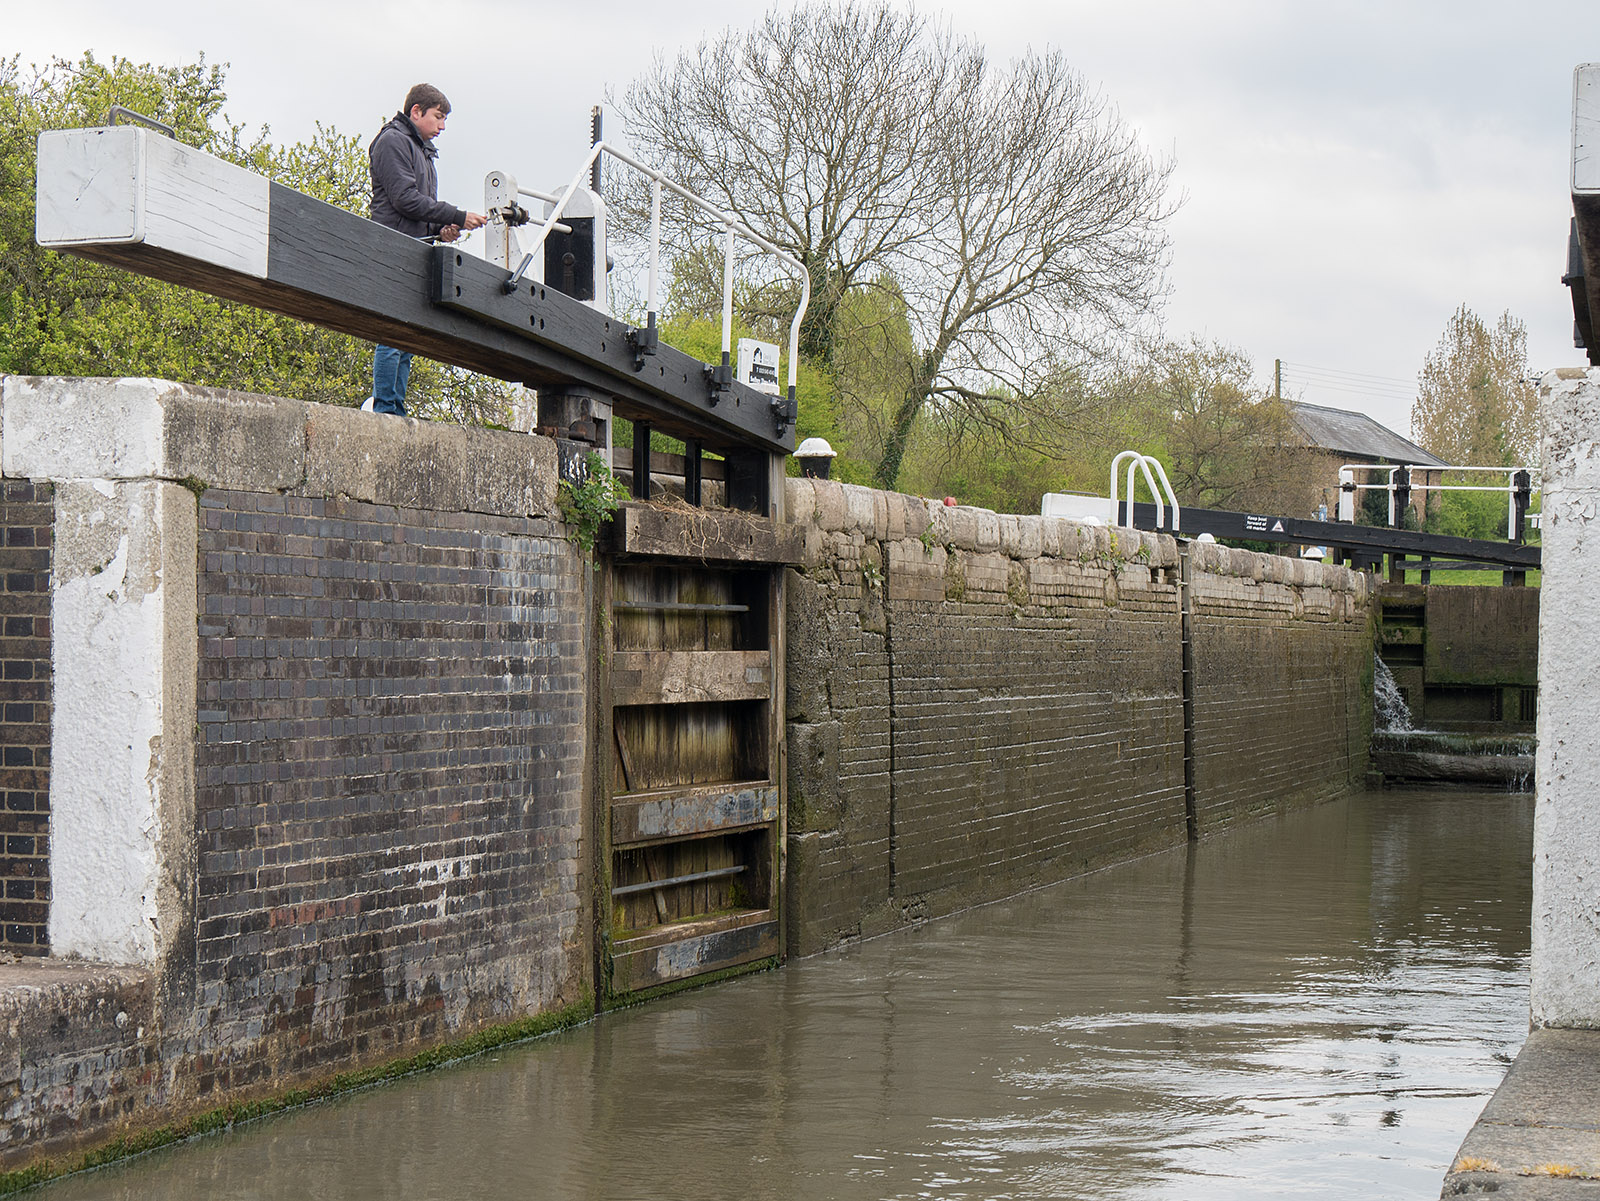 Lowest of the three locks at Soulbury